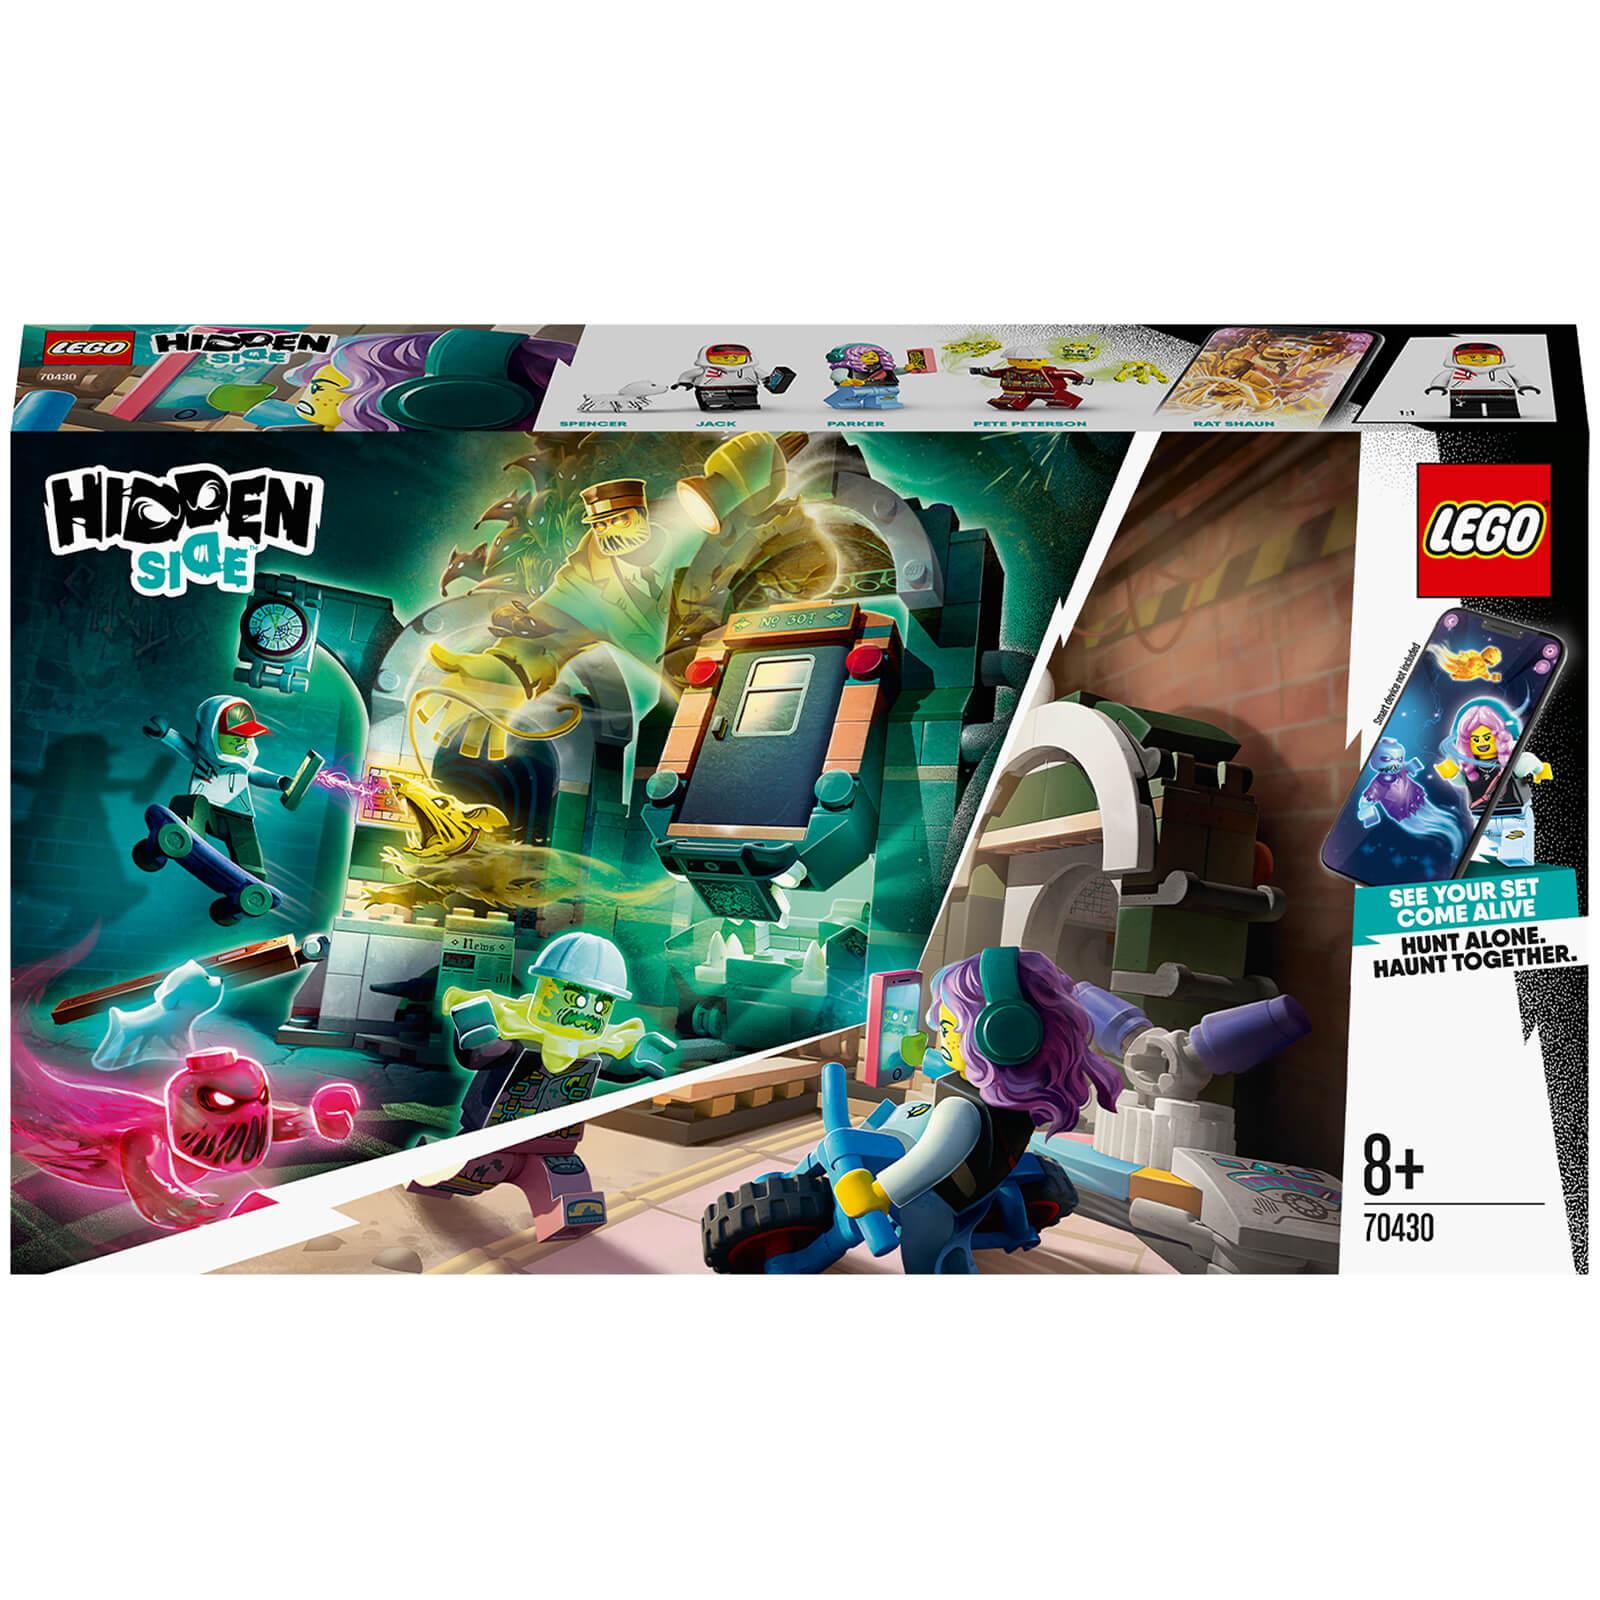 Image of LEGO Hidden Side: Newbury Subway AR Games App Set (70430)